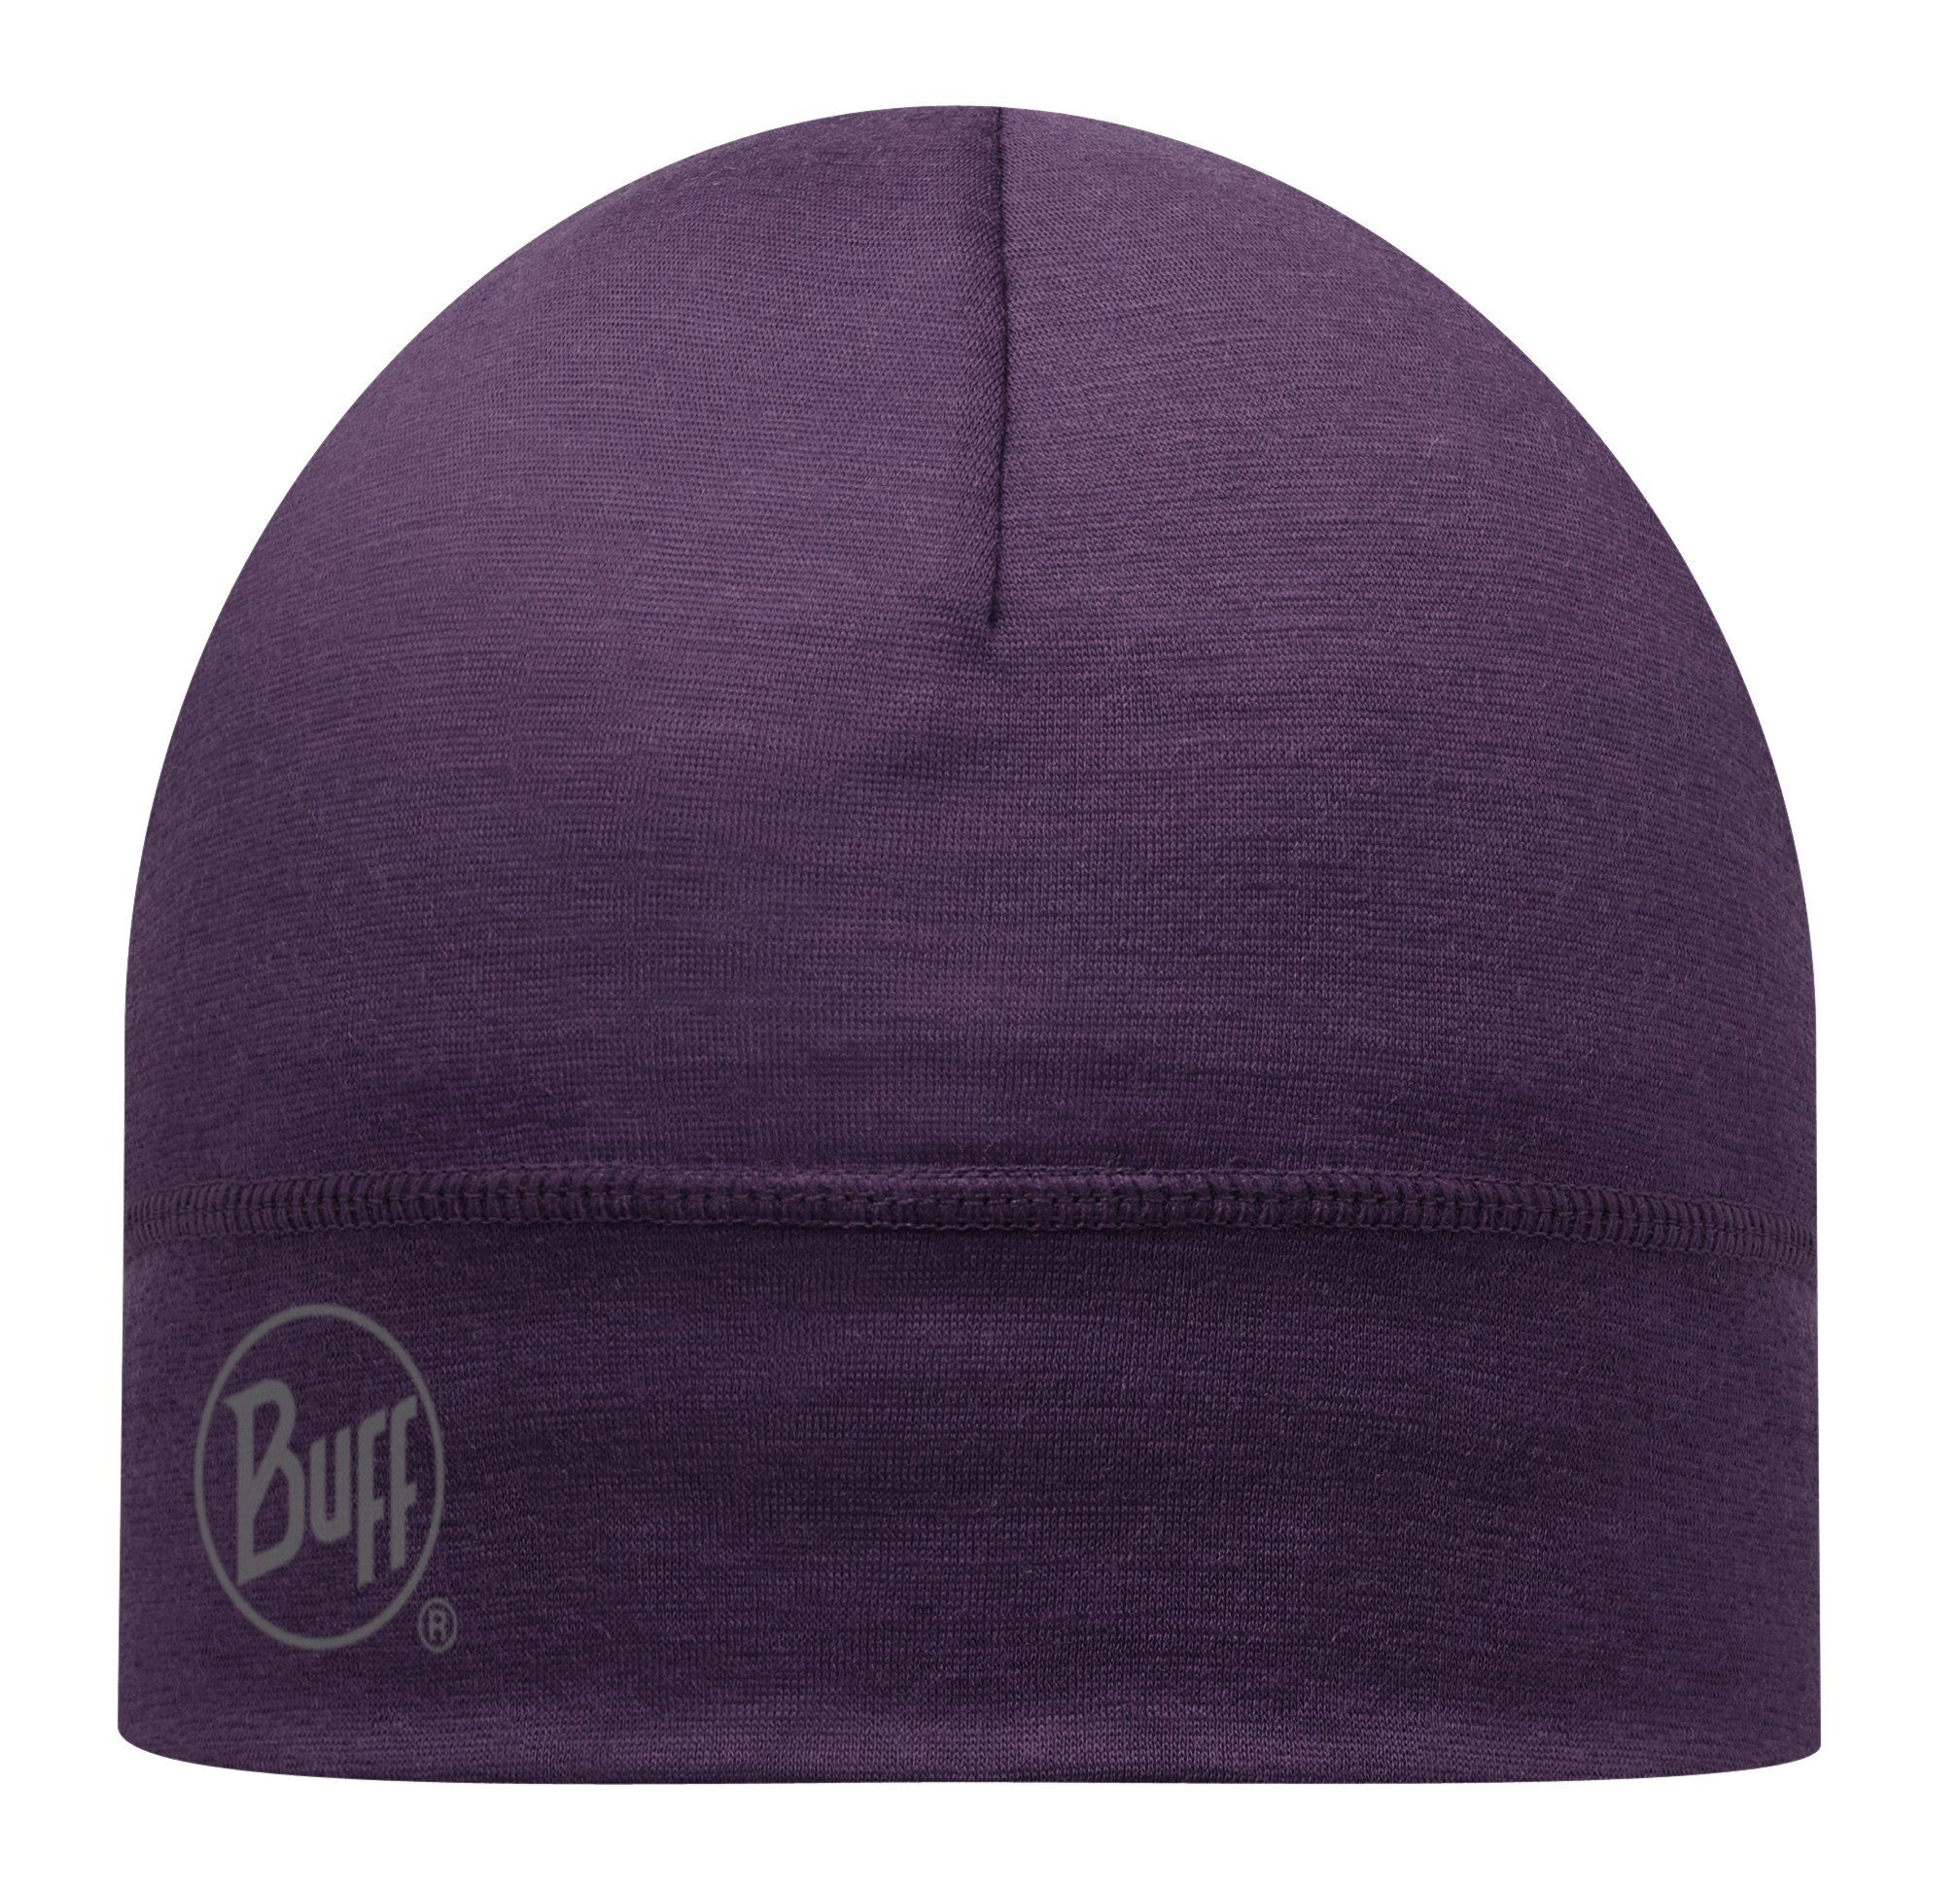 Buff Accessoire »Merino Wool Hat 1 Layer«